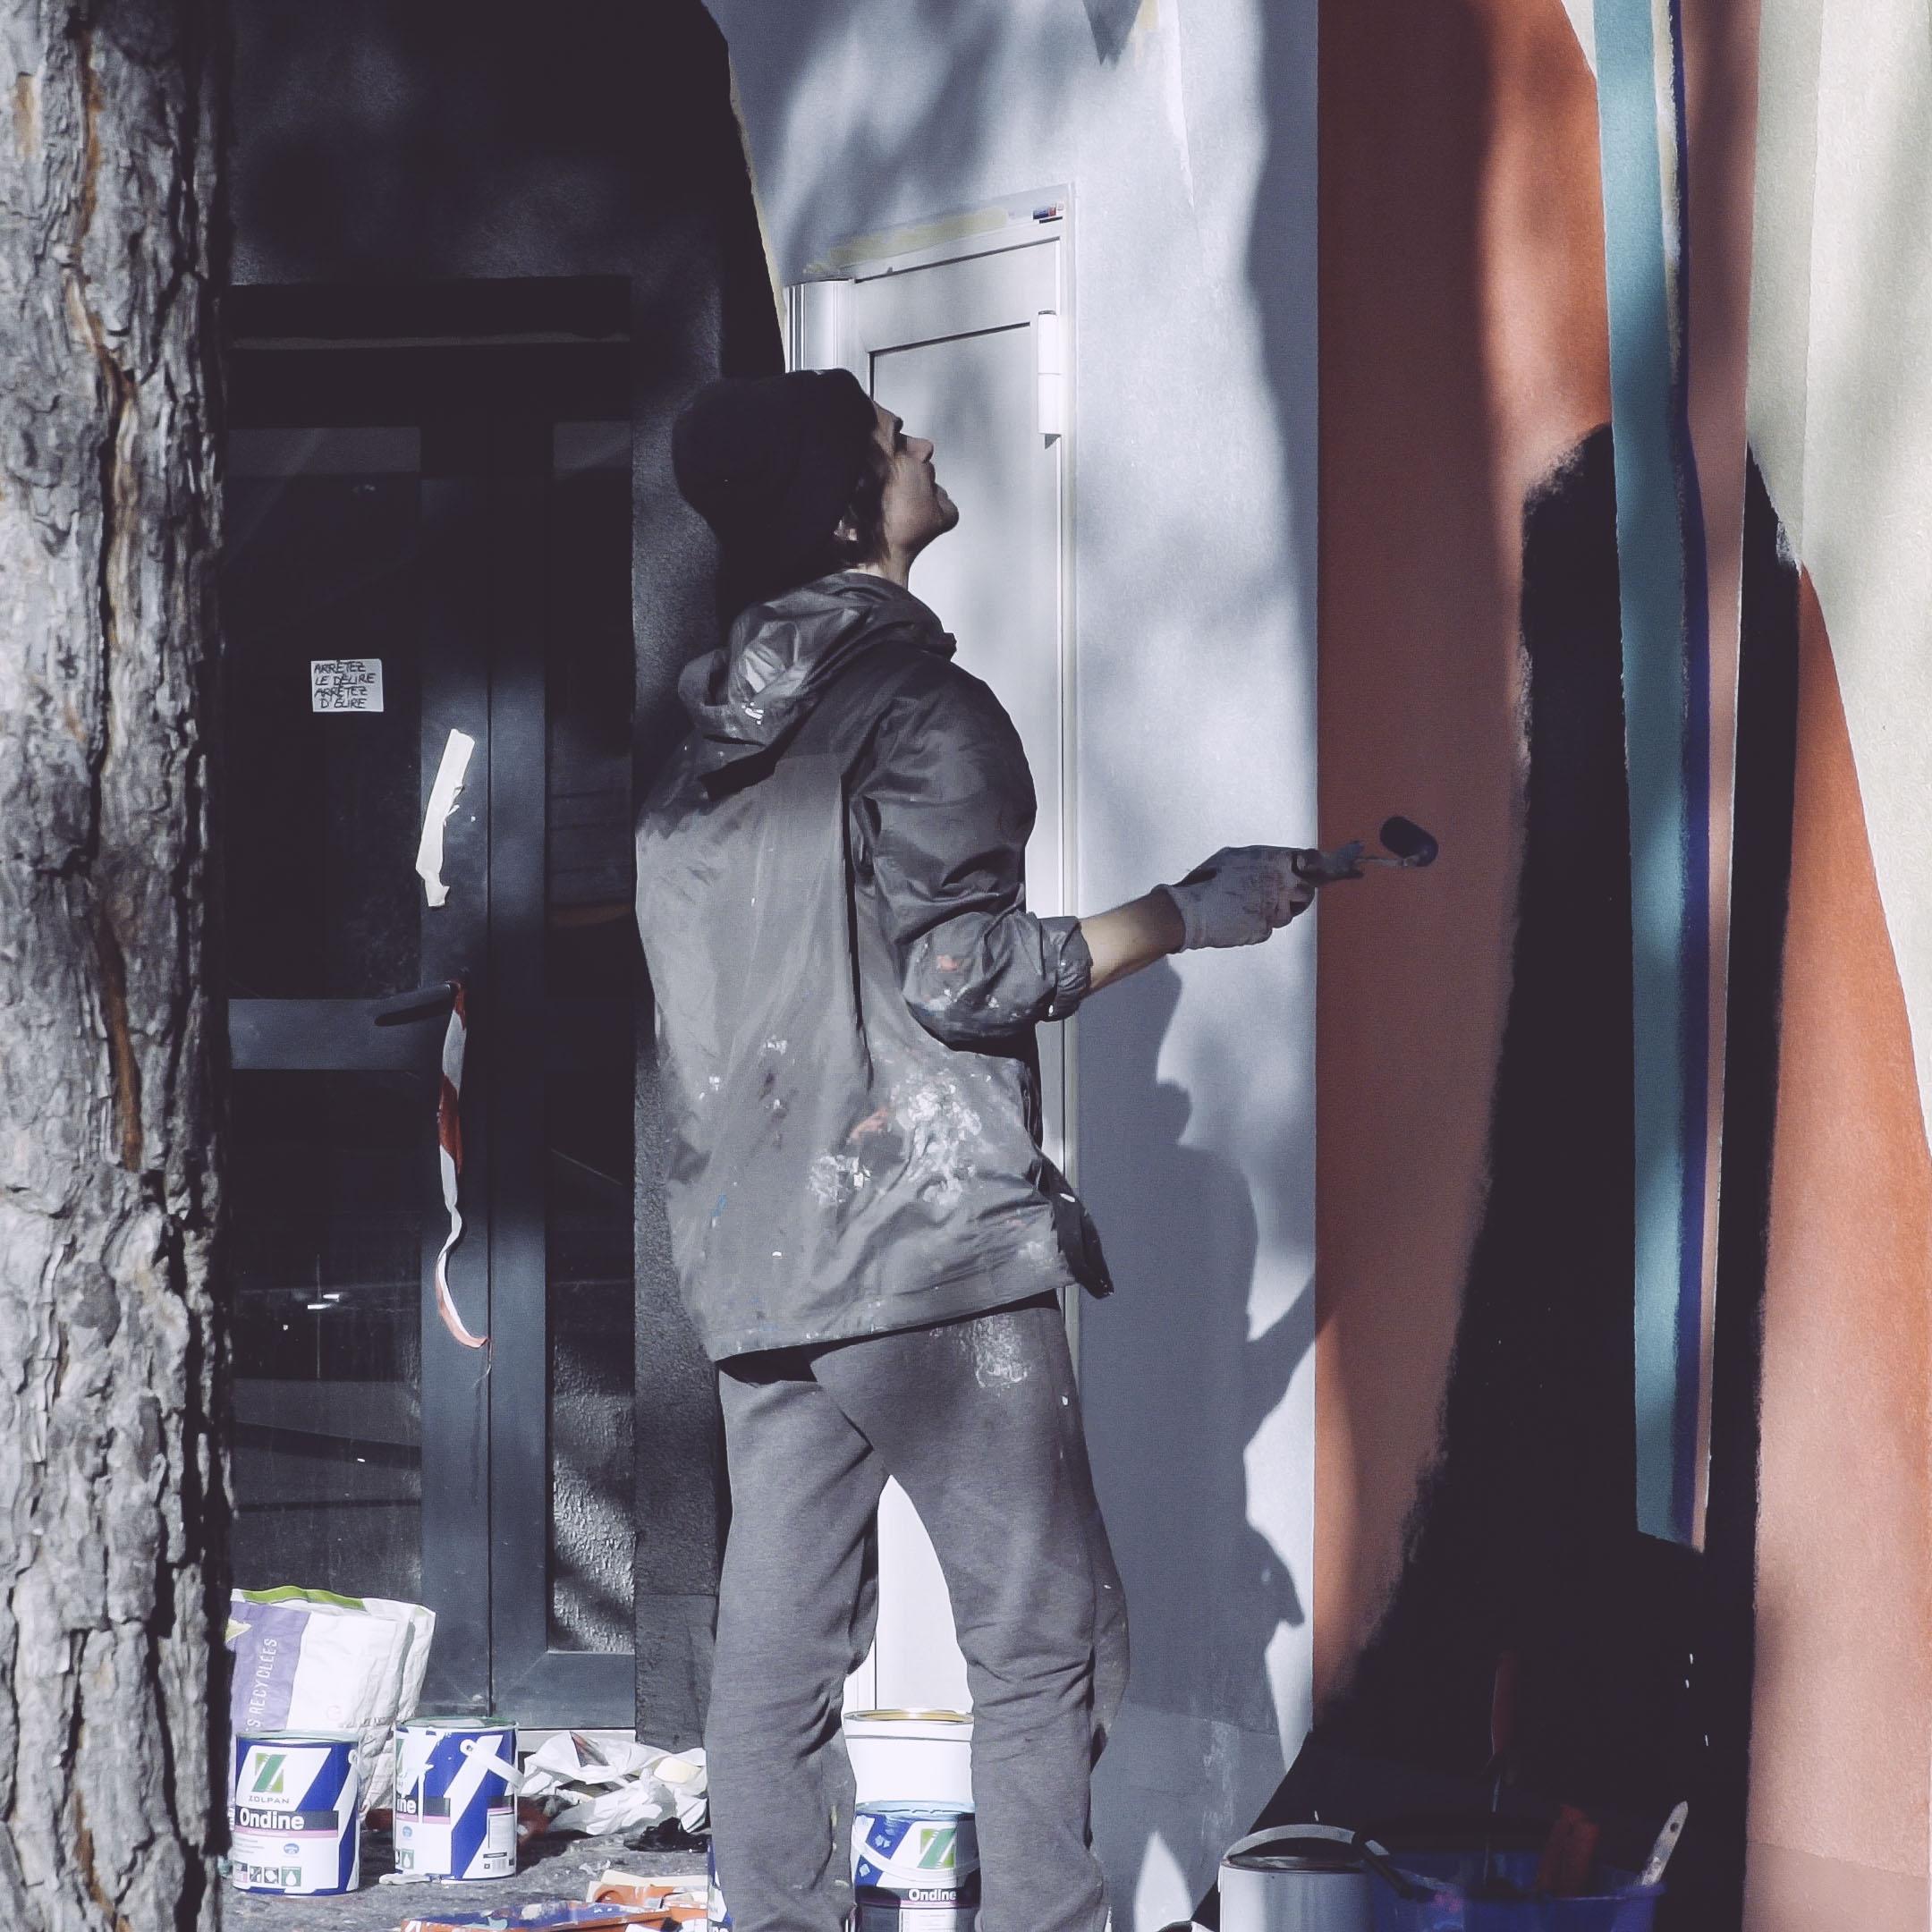 Blo new mural in Perpignan, France Artes & contextos AM ebancpkcndkecikh